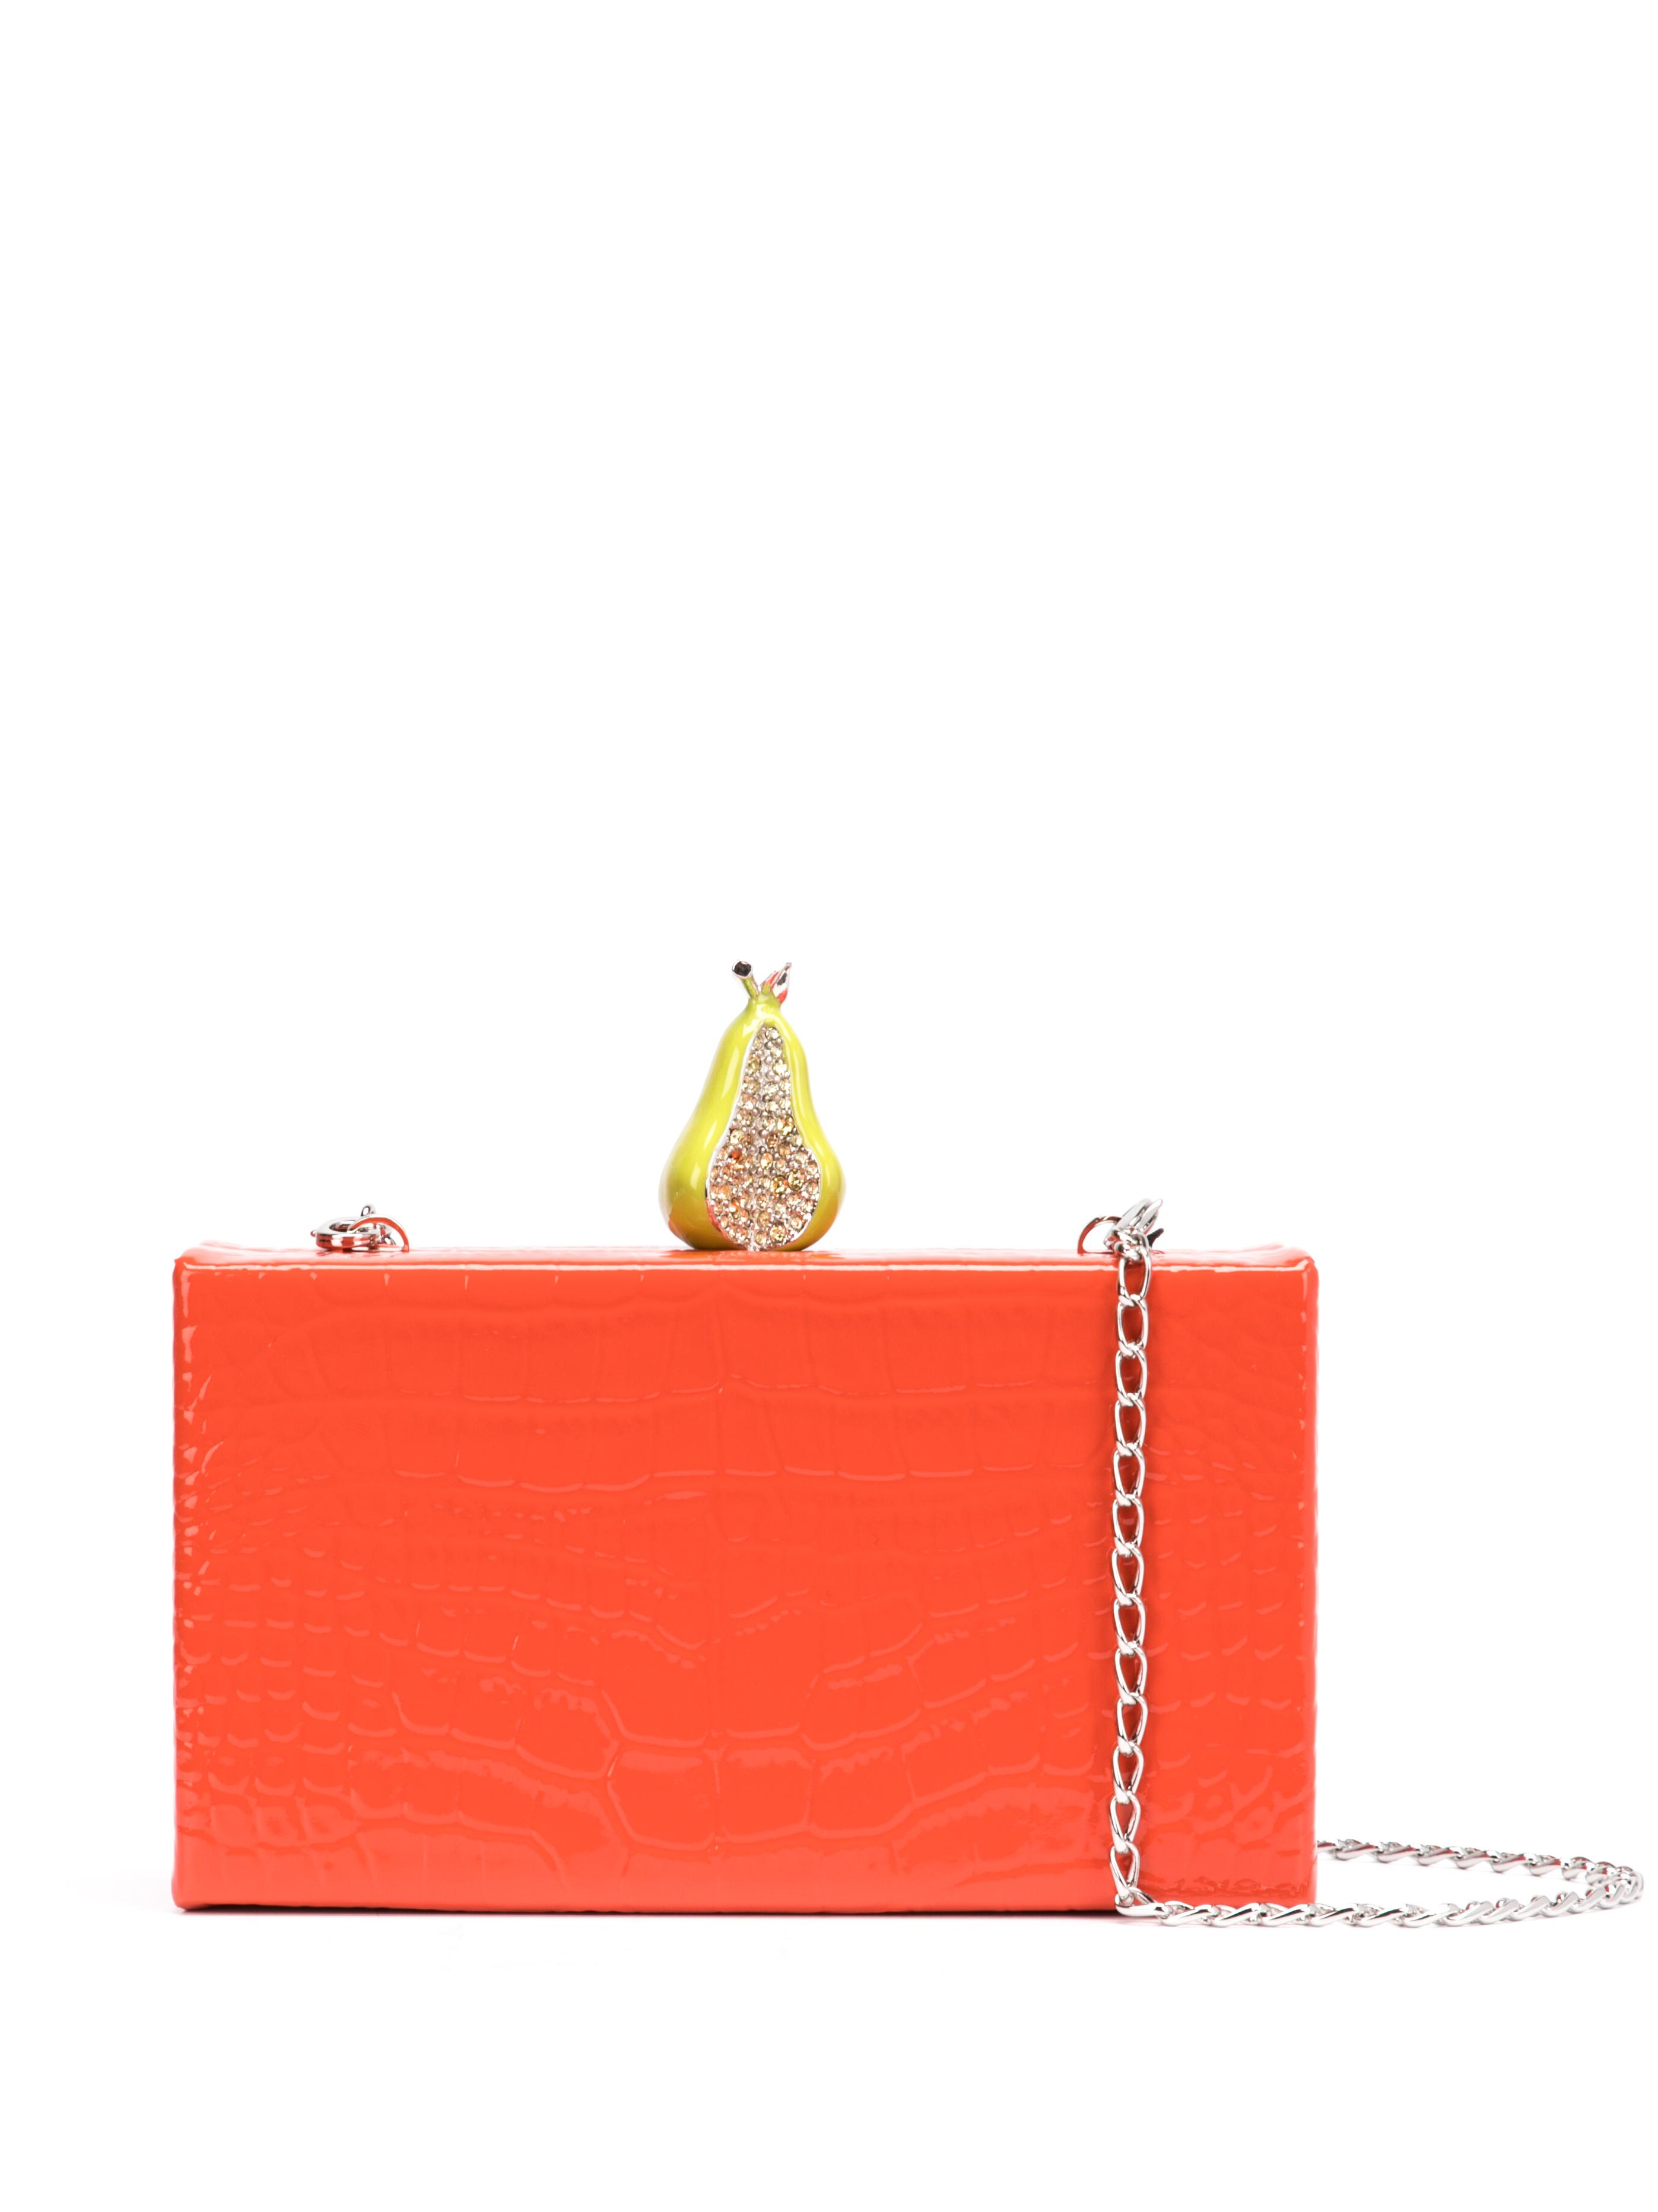 Jean Box With Fruit Topper Item # S19JB18001